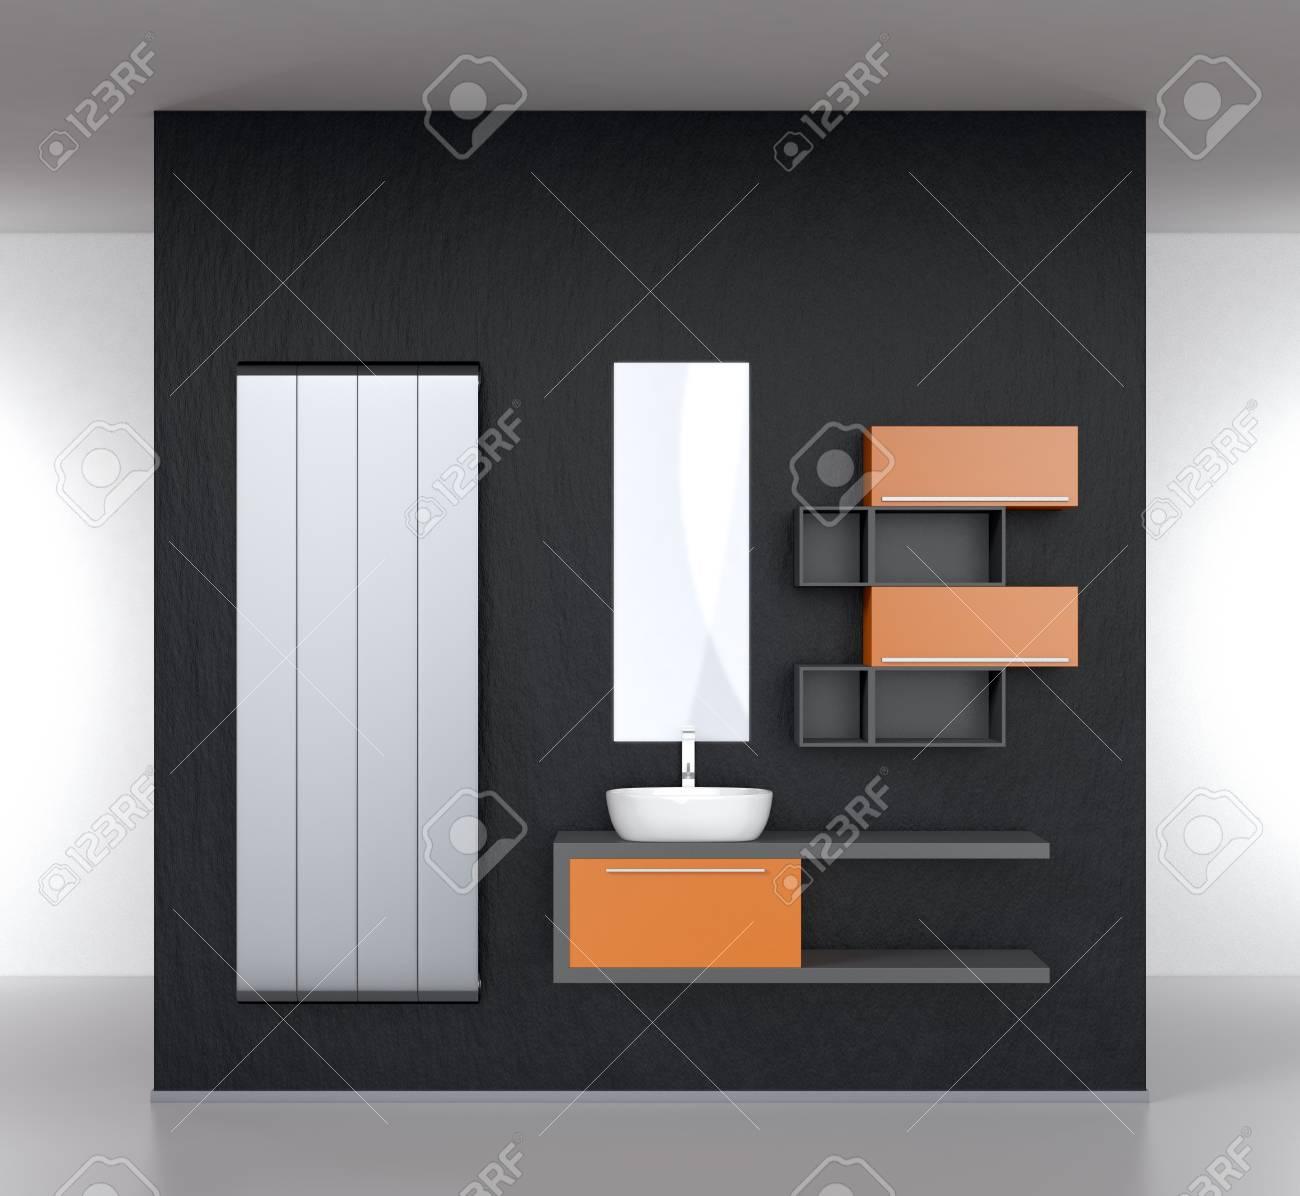 Modern Bathroom Furnishings With A Radiator On A Dark Wall D - Modern bathroom furnishings